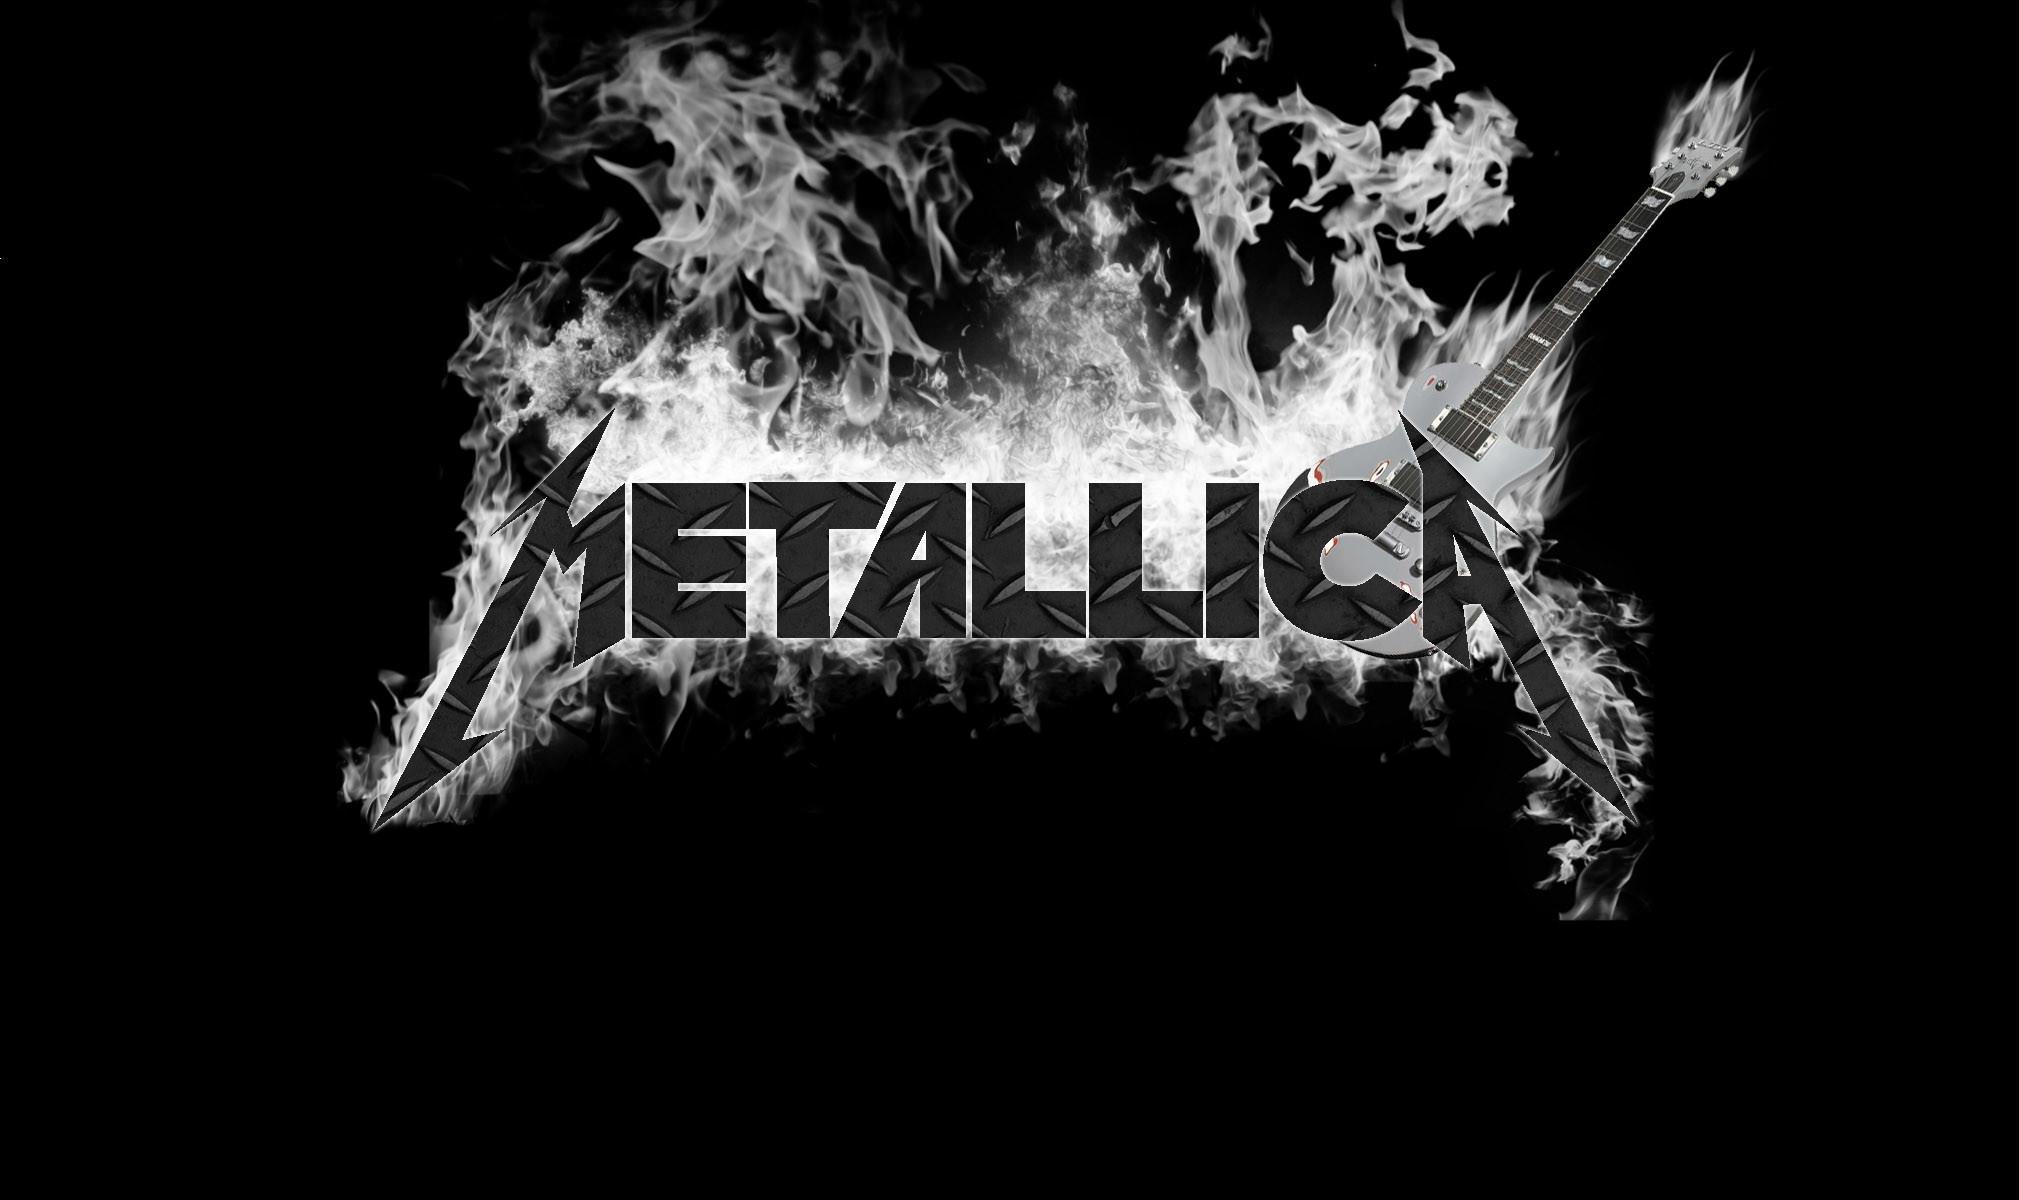 Metallica Name Logo